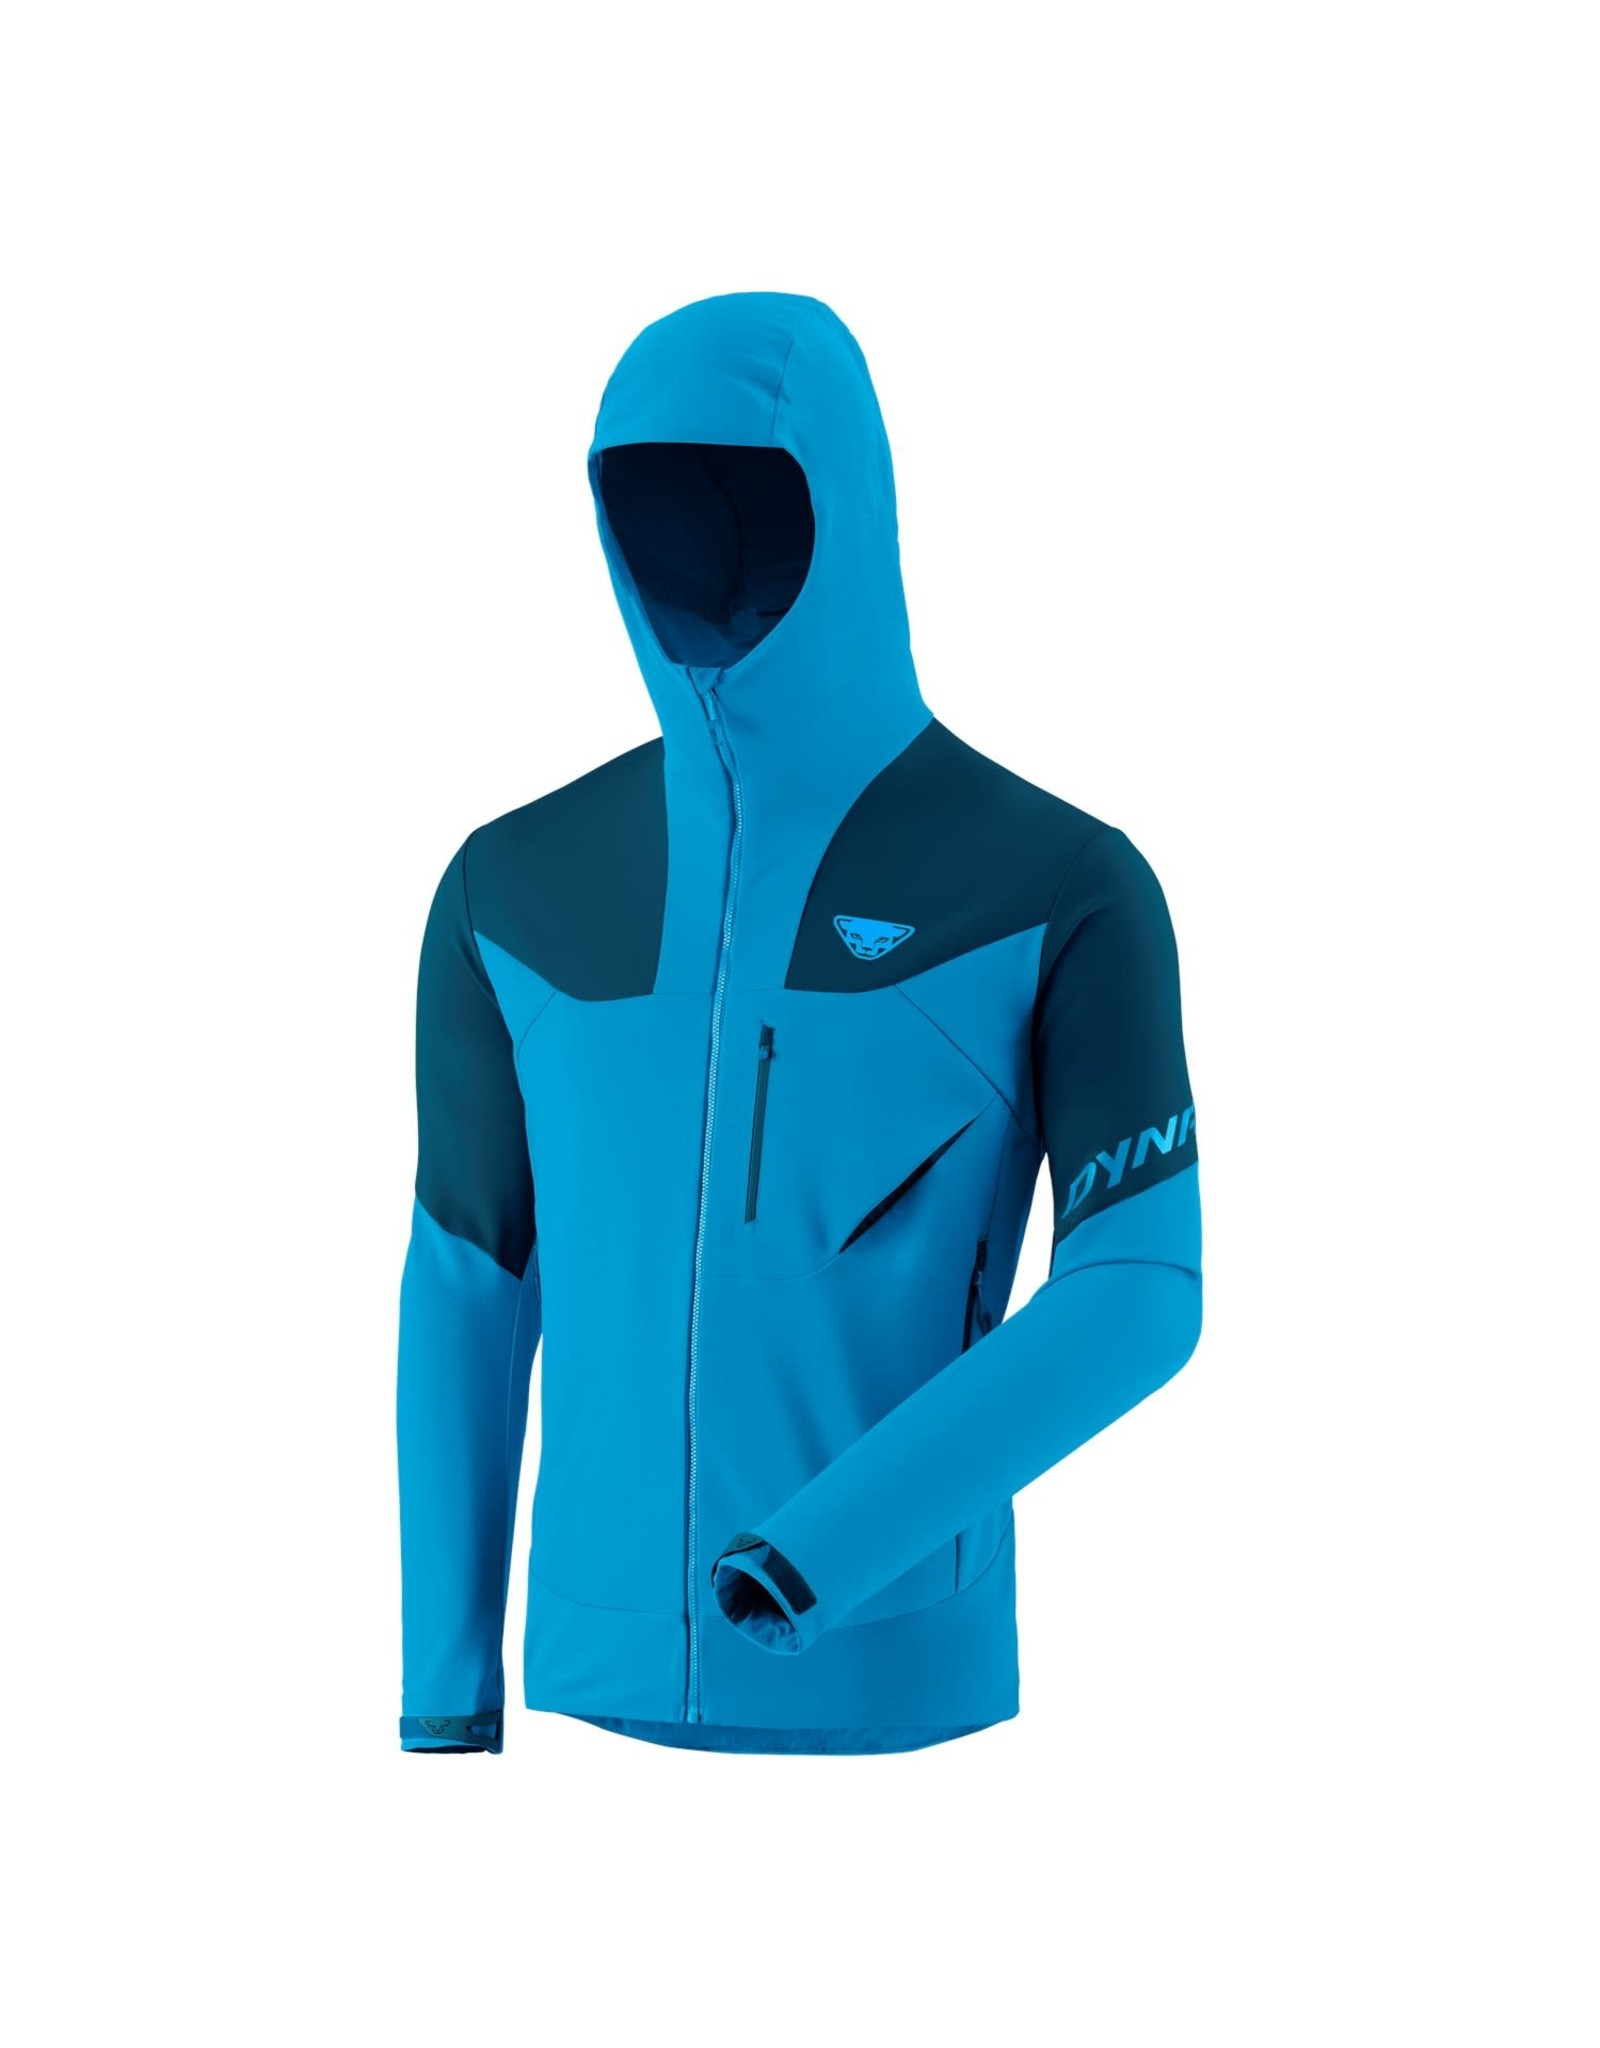 Dynafit Dynafit Mercury Pro Jacket - Men